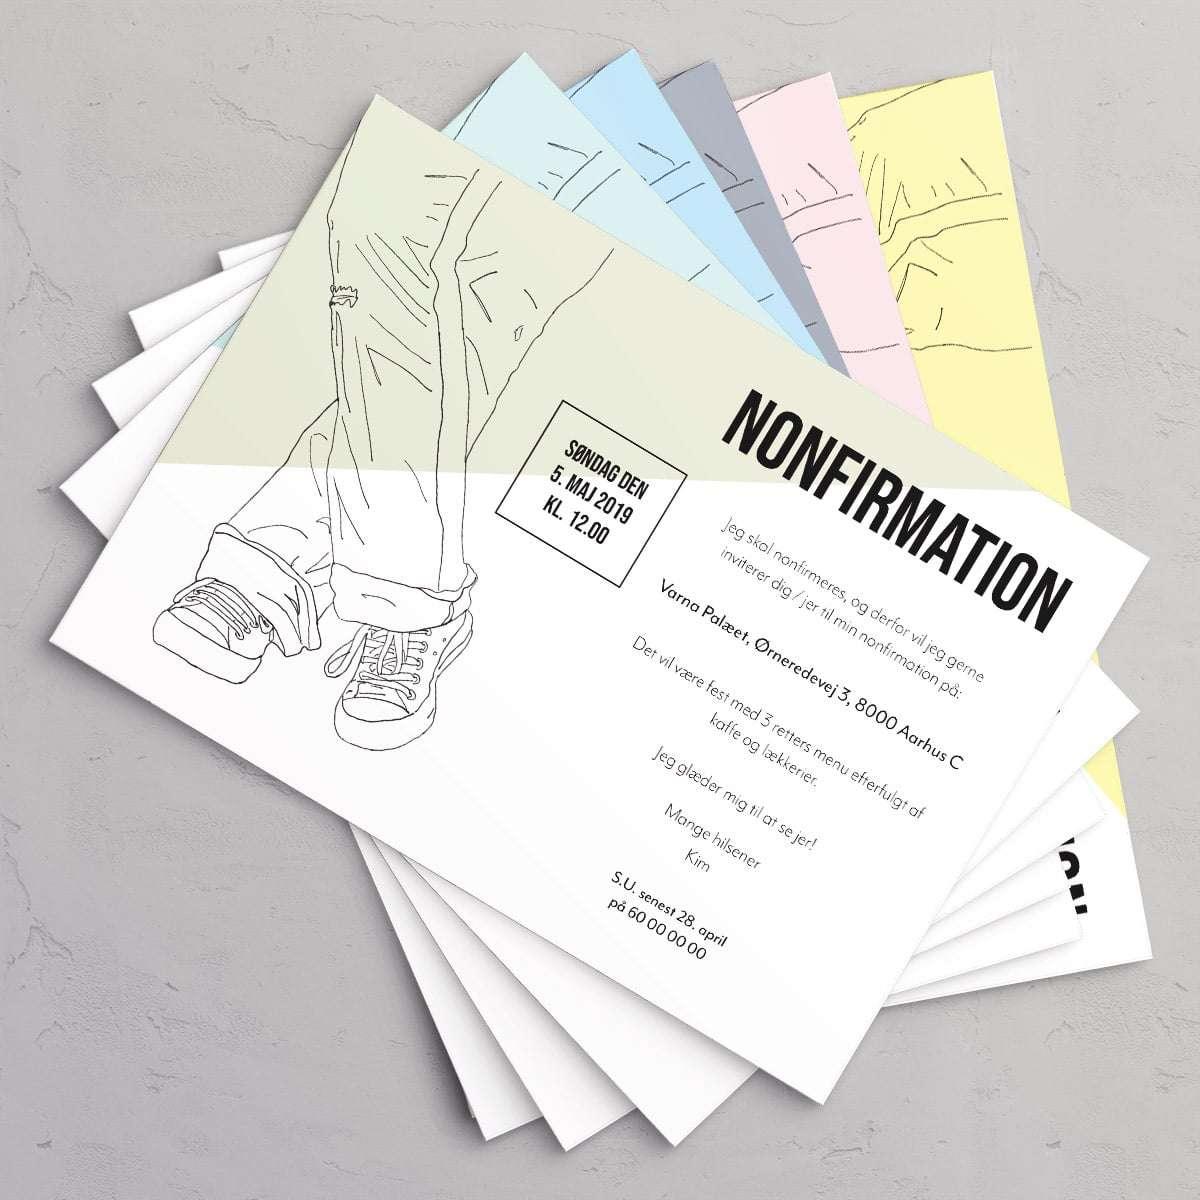 Sneaks nonfirmationsinvitation i farverne Seafoam, Ice Blue, Mint, Slate, Petal og Limoncello.